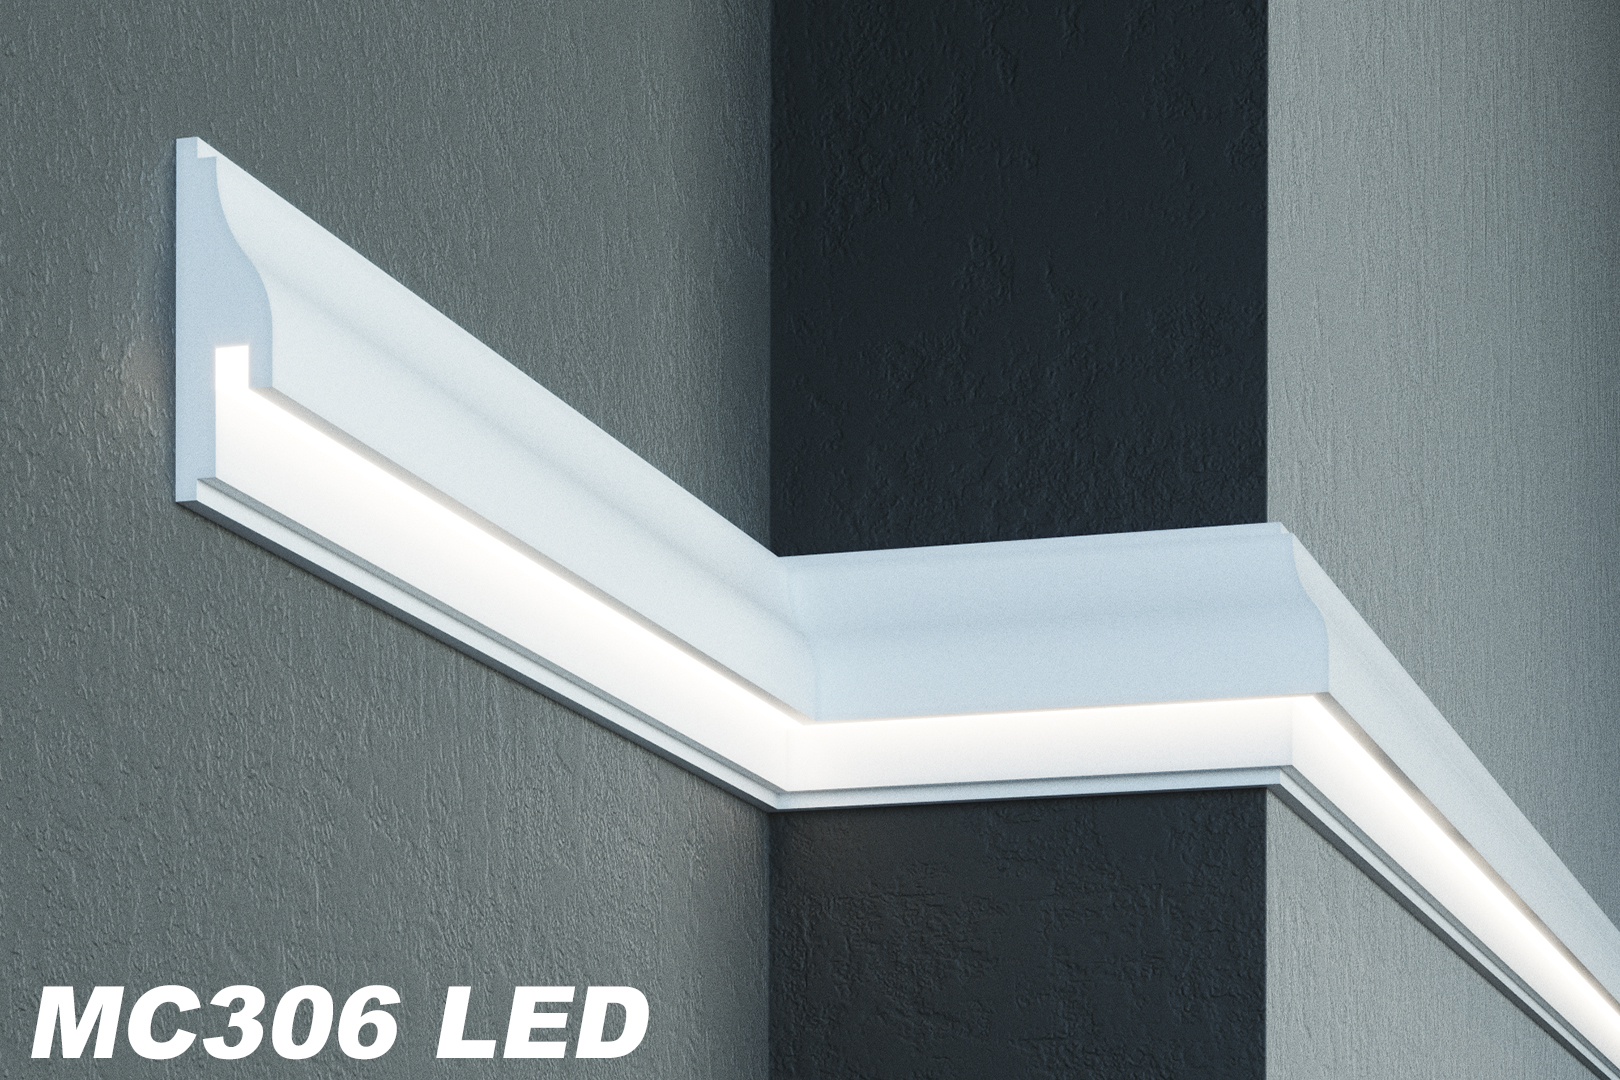 Paket 20 meter led fassadenprofile indirekte beleuchtung sto fest 170x55mm mc306 led hexim - Indirekte wandbeleuchtung ...